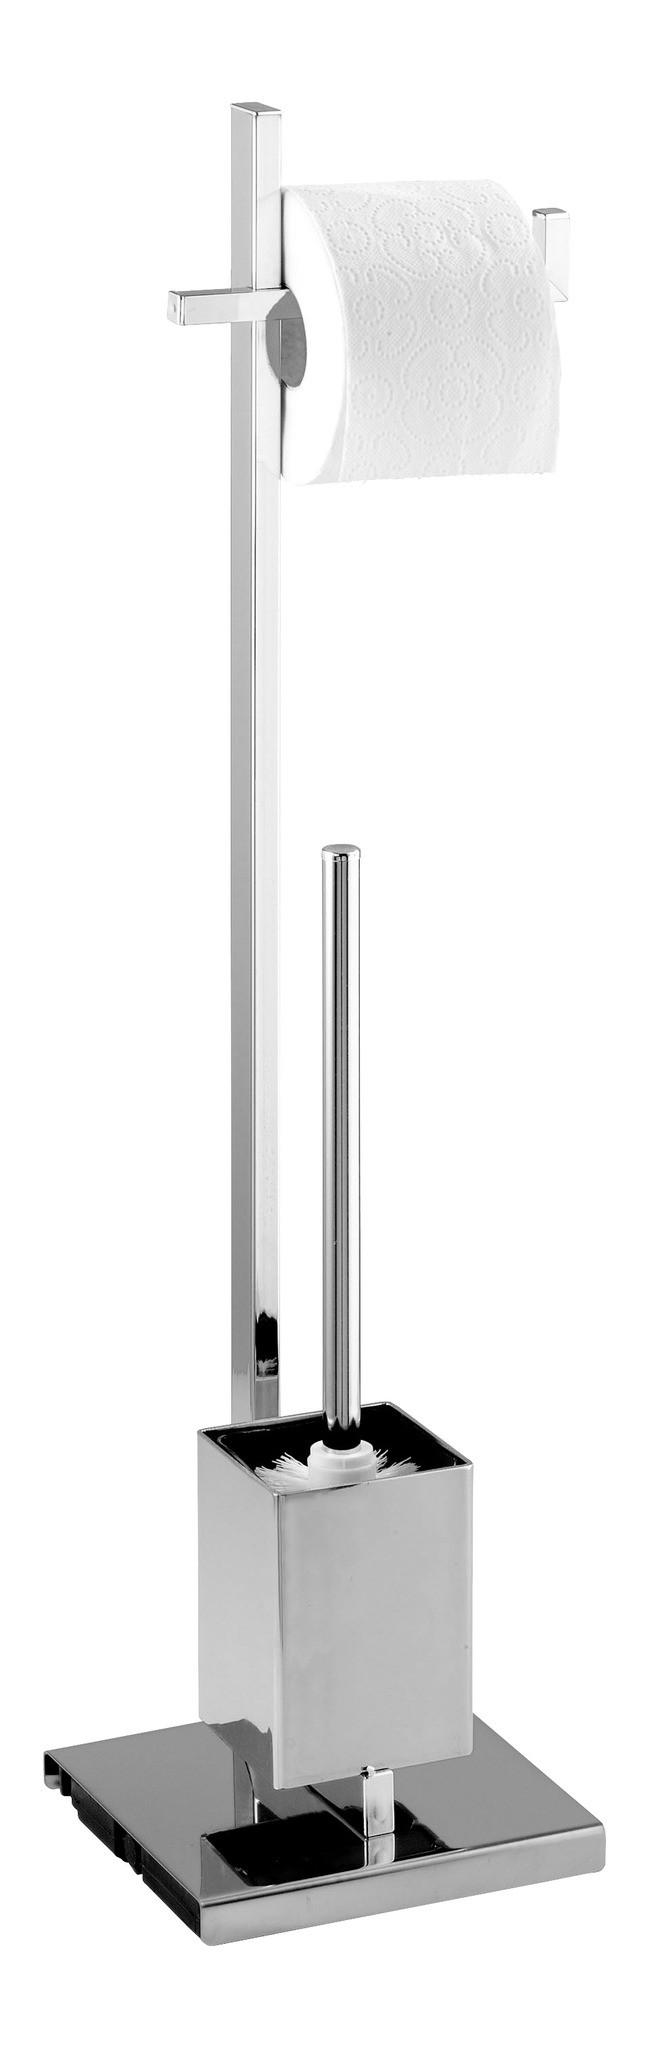 Stand WC-Garnitur Quadro